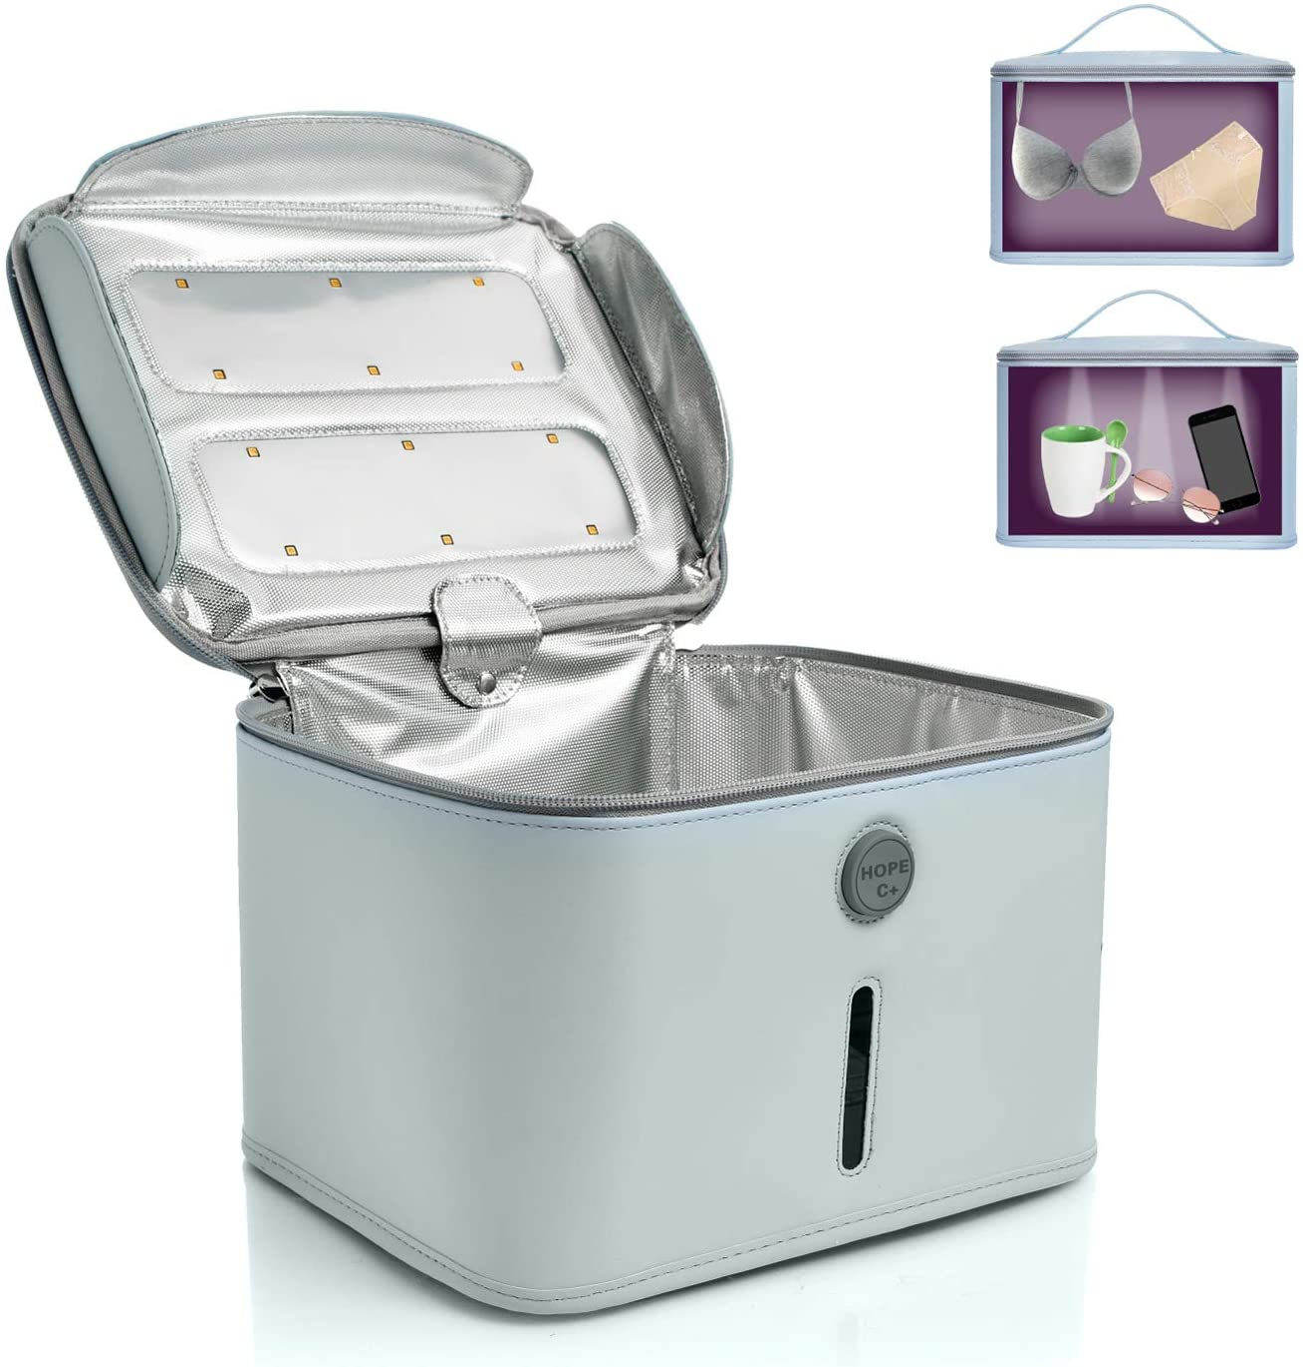 Hope C+ UVC Box sterilizer, Blue Sanitizing Box Portable Bag UVC Light Cleaner UV Sterilizer, Large Size Light Box for Phone, Beauty Tool99.99% Cleaned in 3 Minutes.